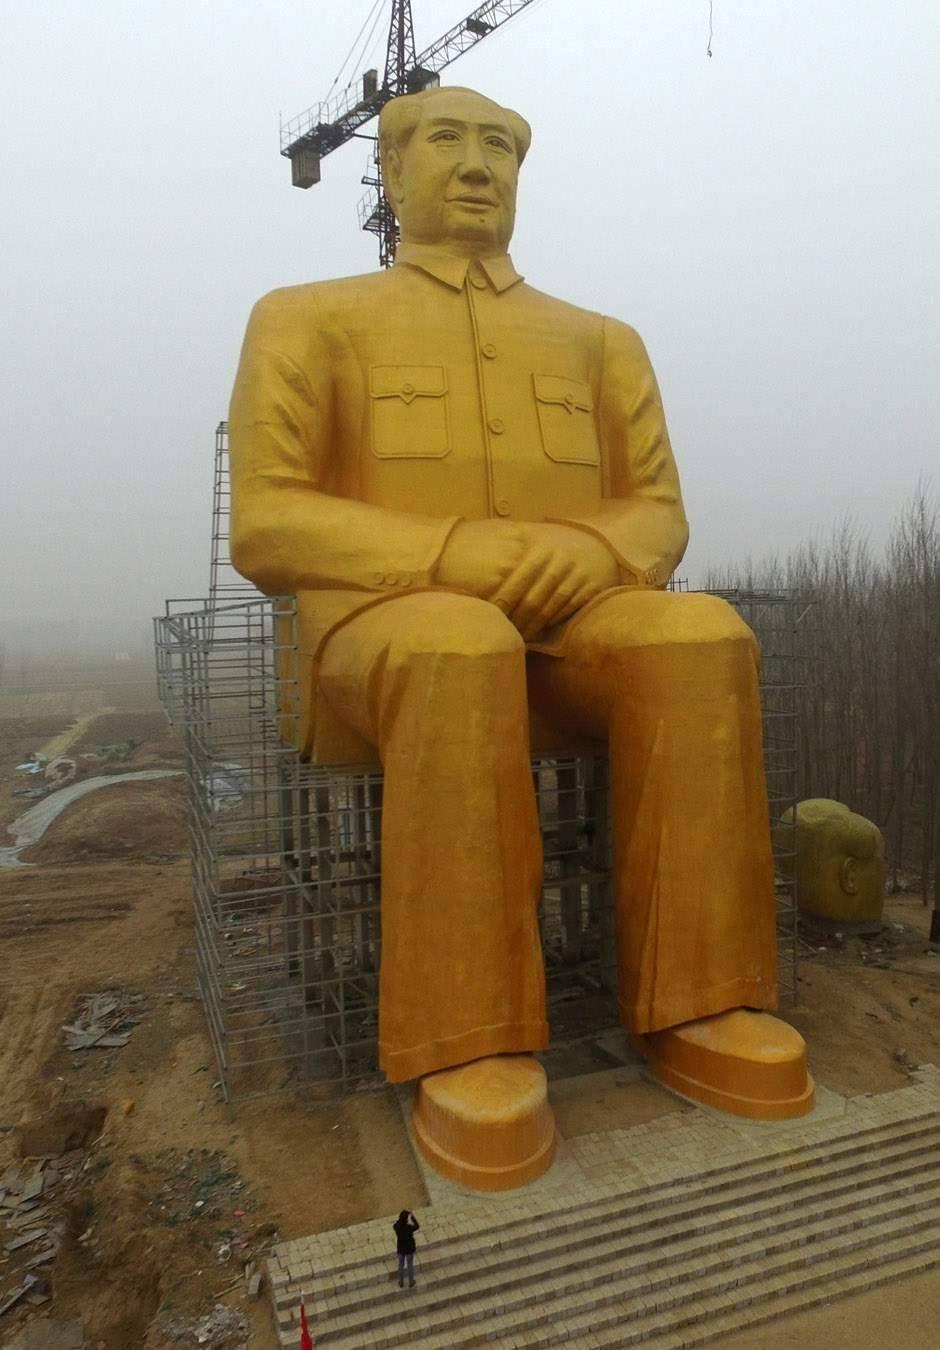 Golden Mao Zedong demolido